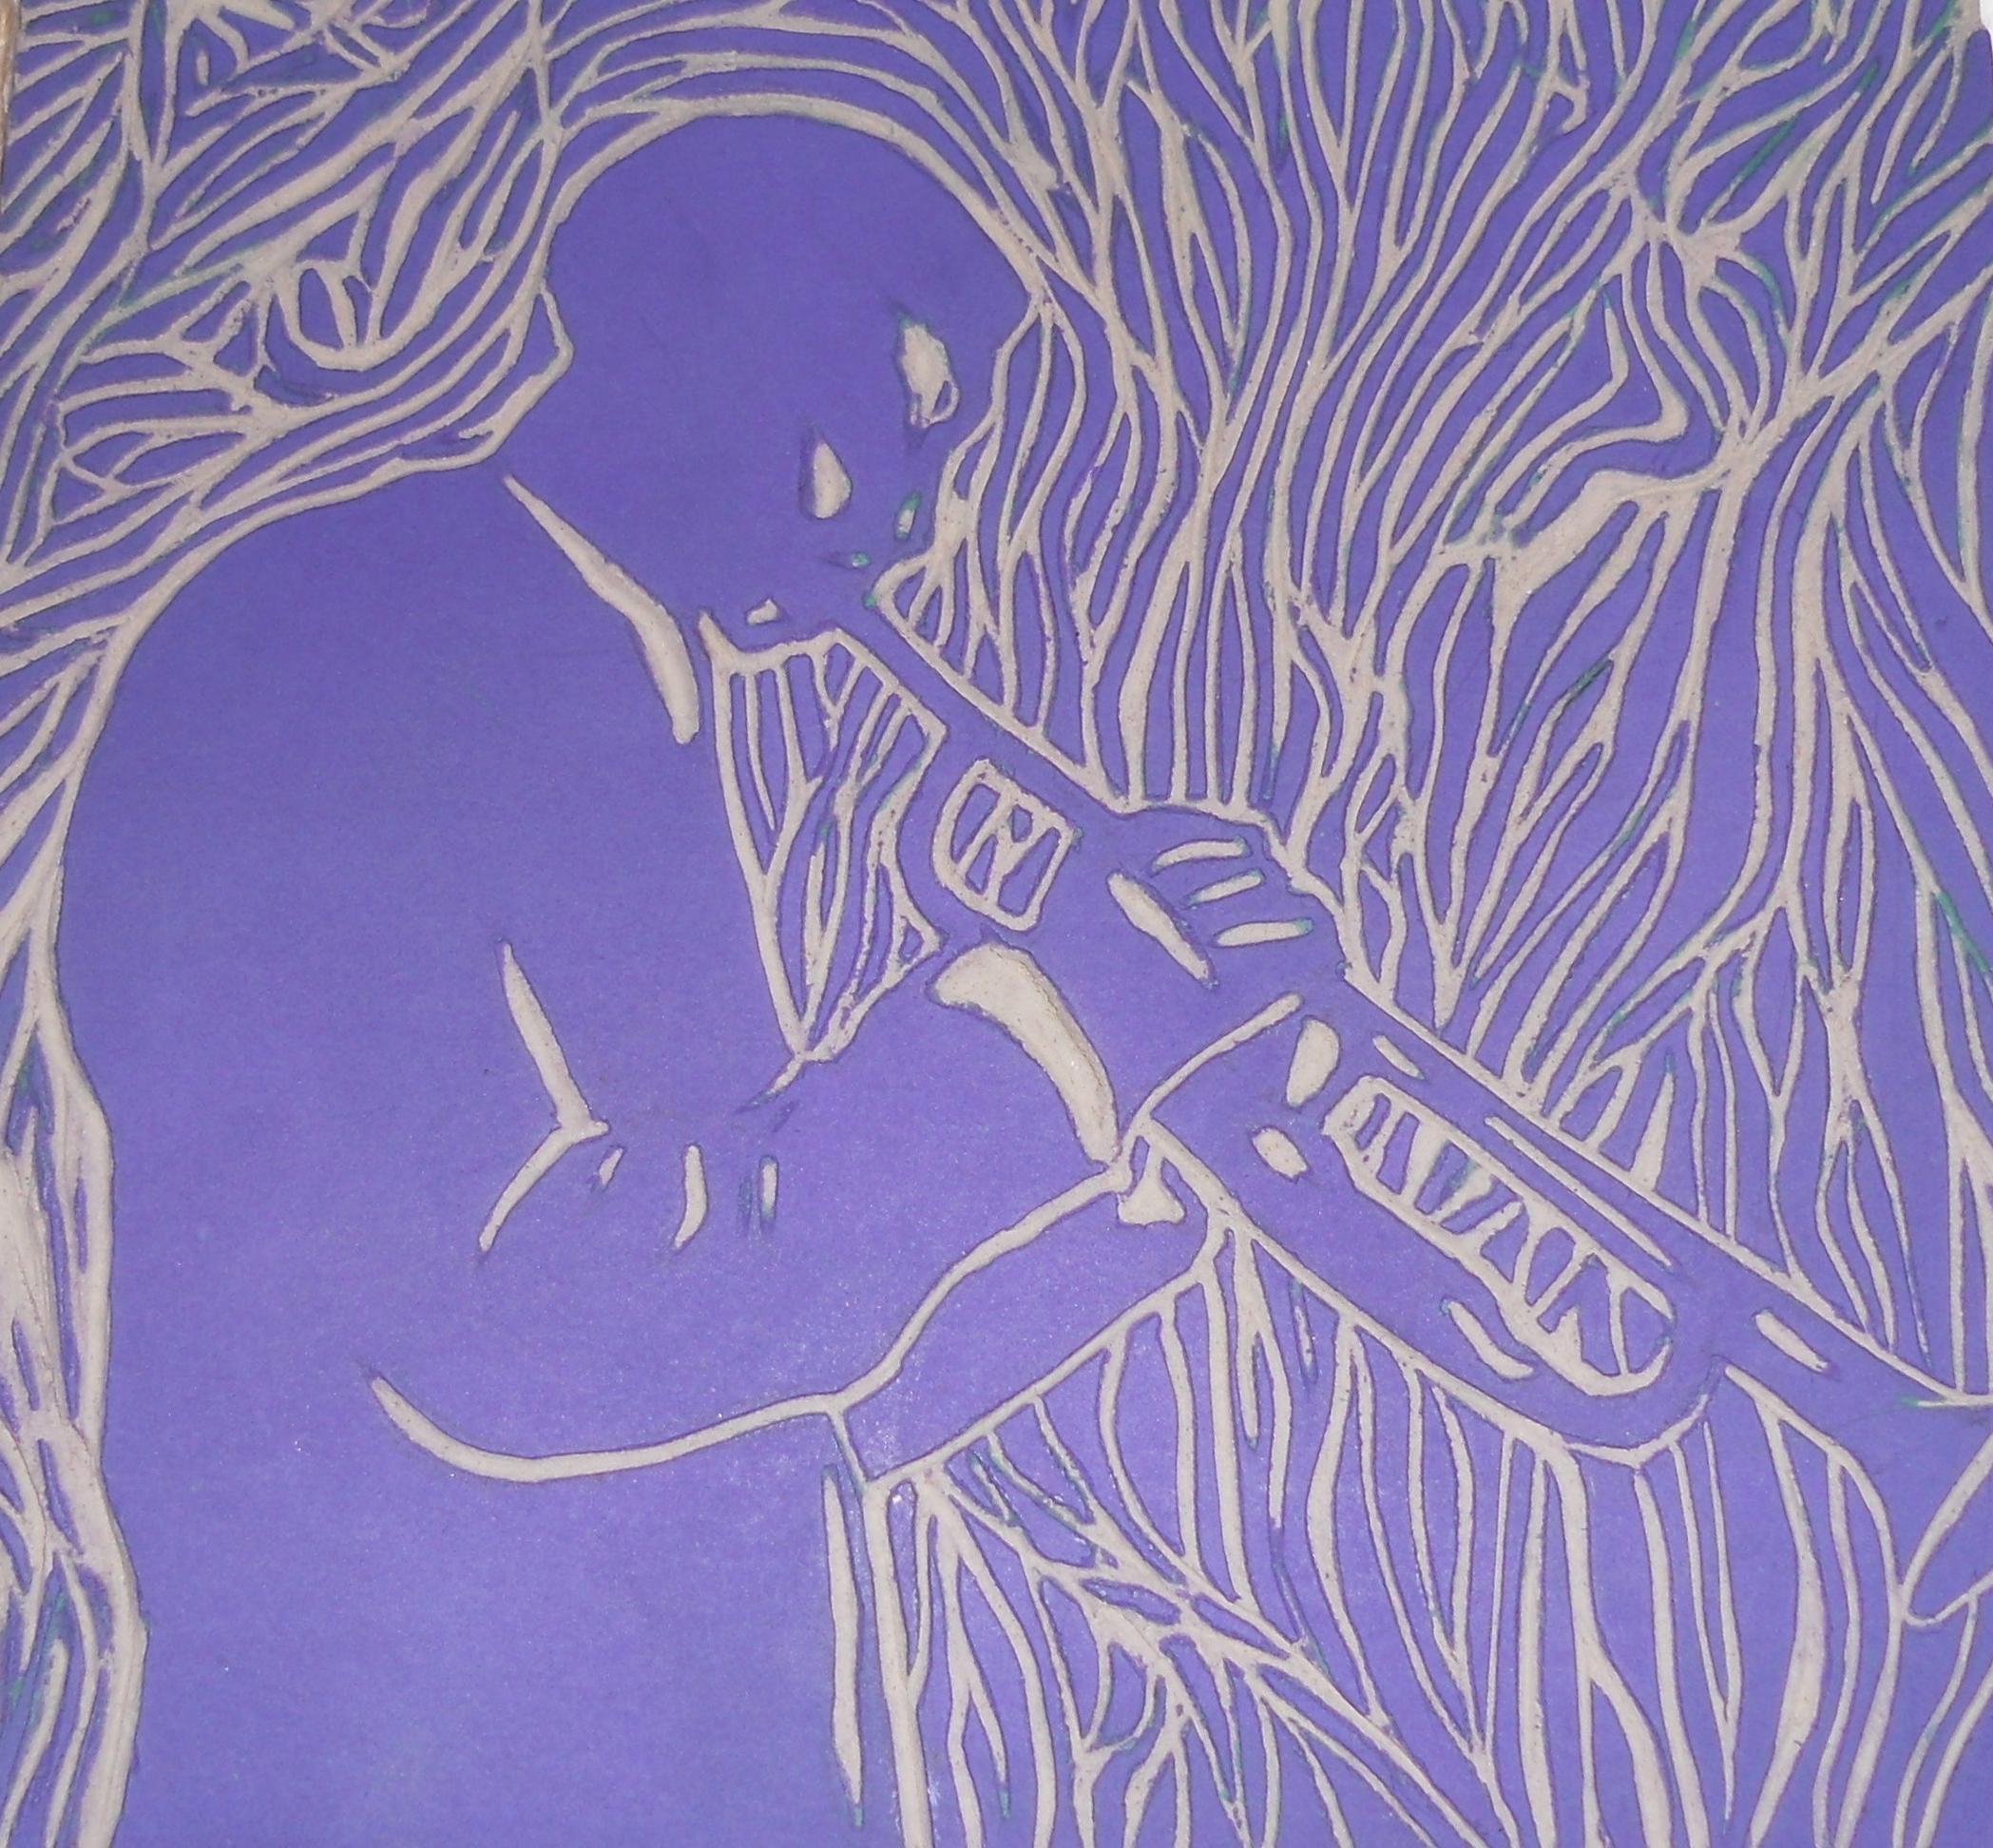 Copy of Miles Davis